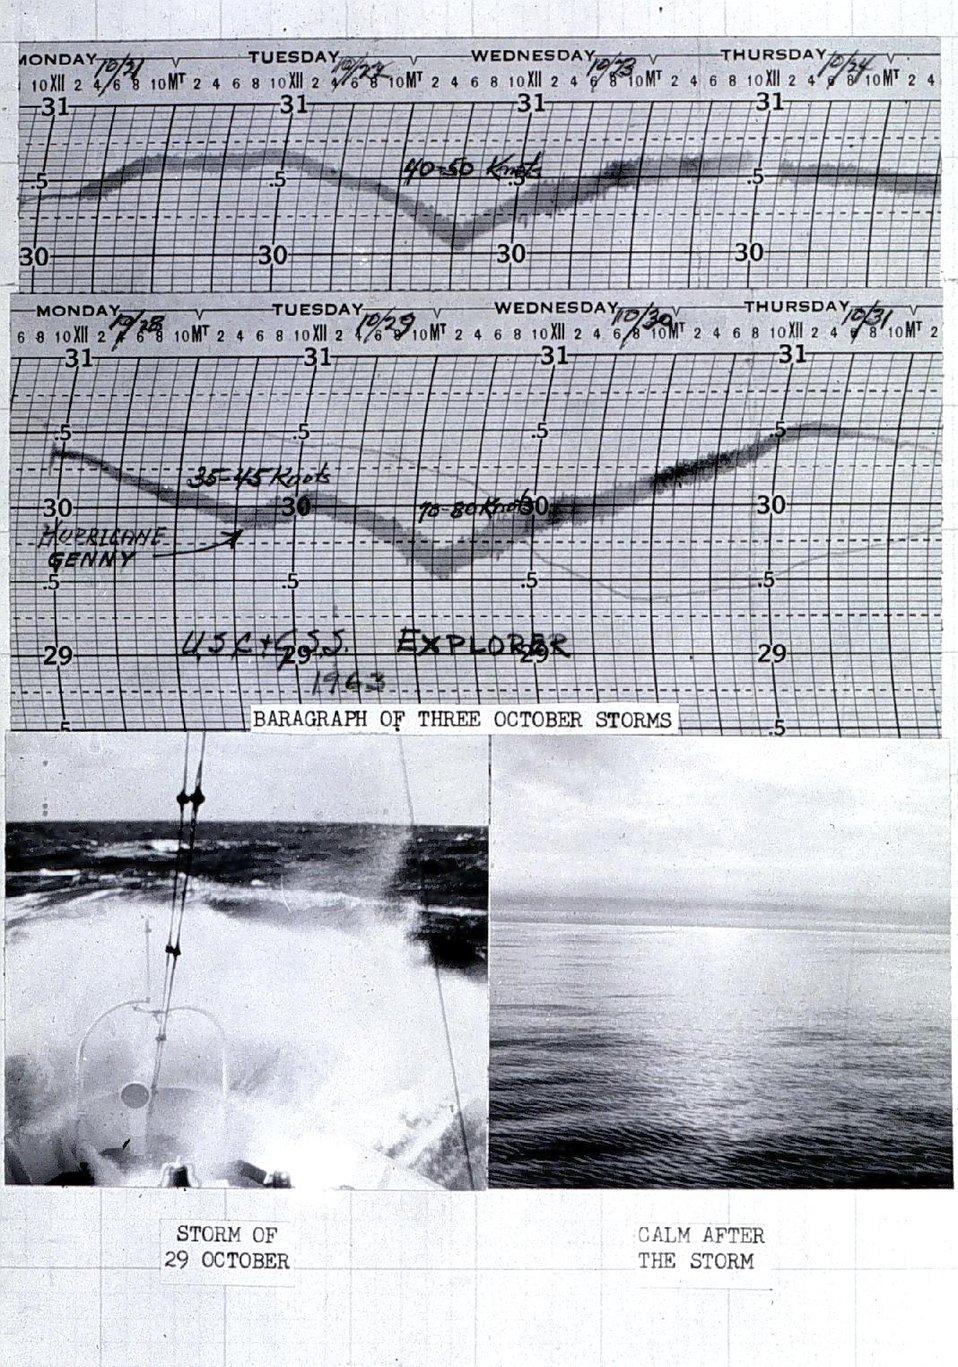 Annotated barograph showing storm passages. EXPLORER cable survey to St. Hilaire, France